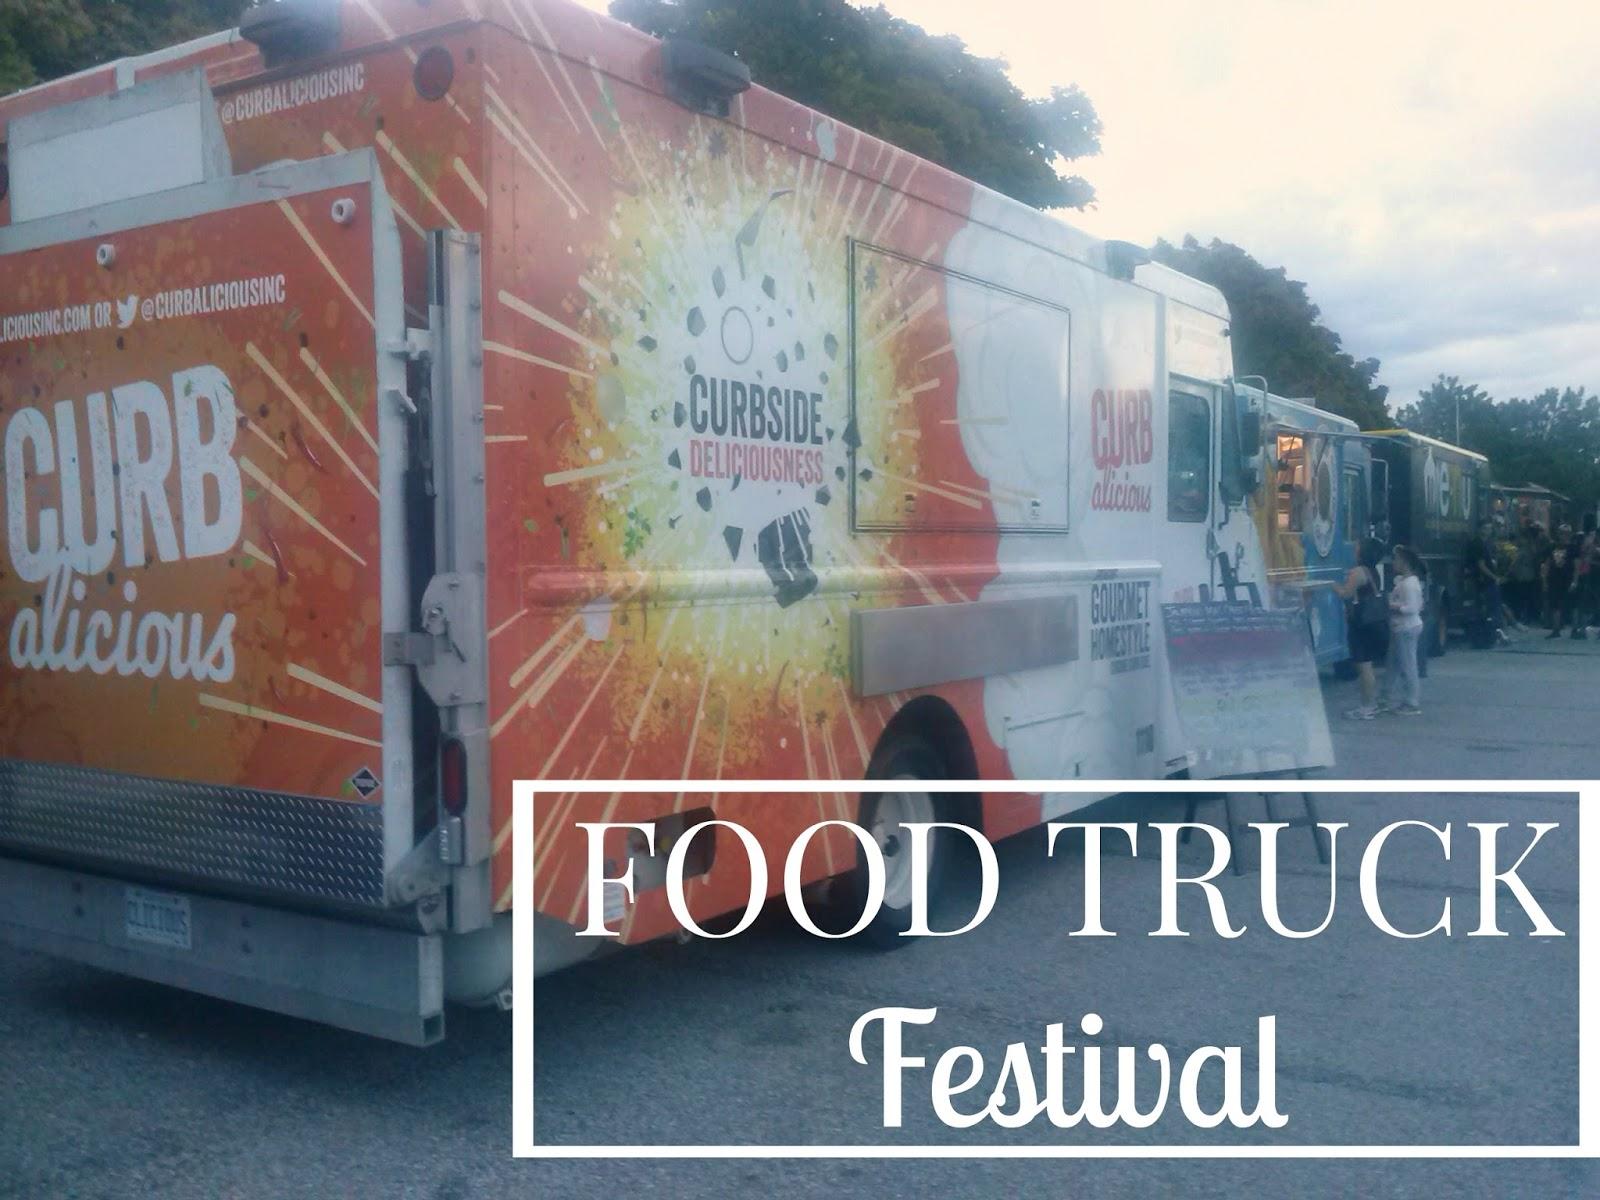 Toronto's Food Truck Festival 2014